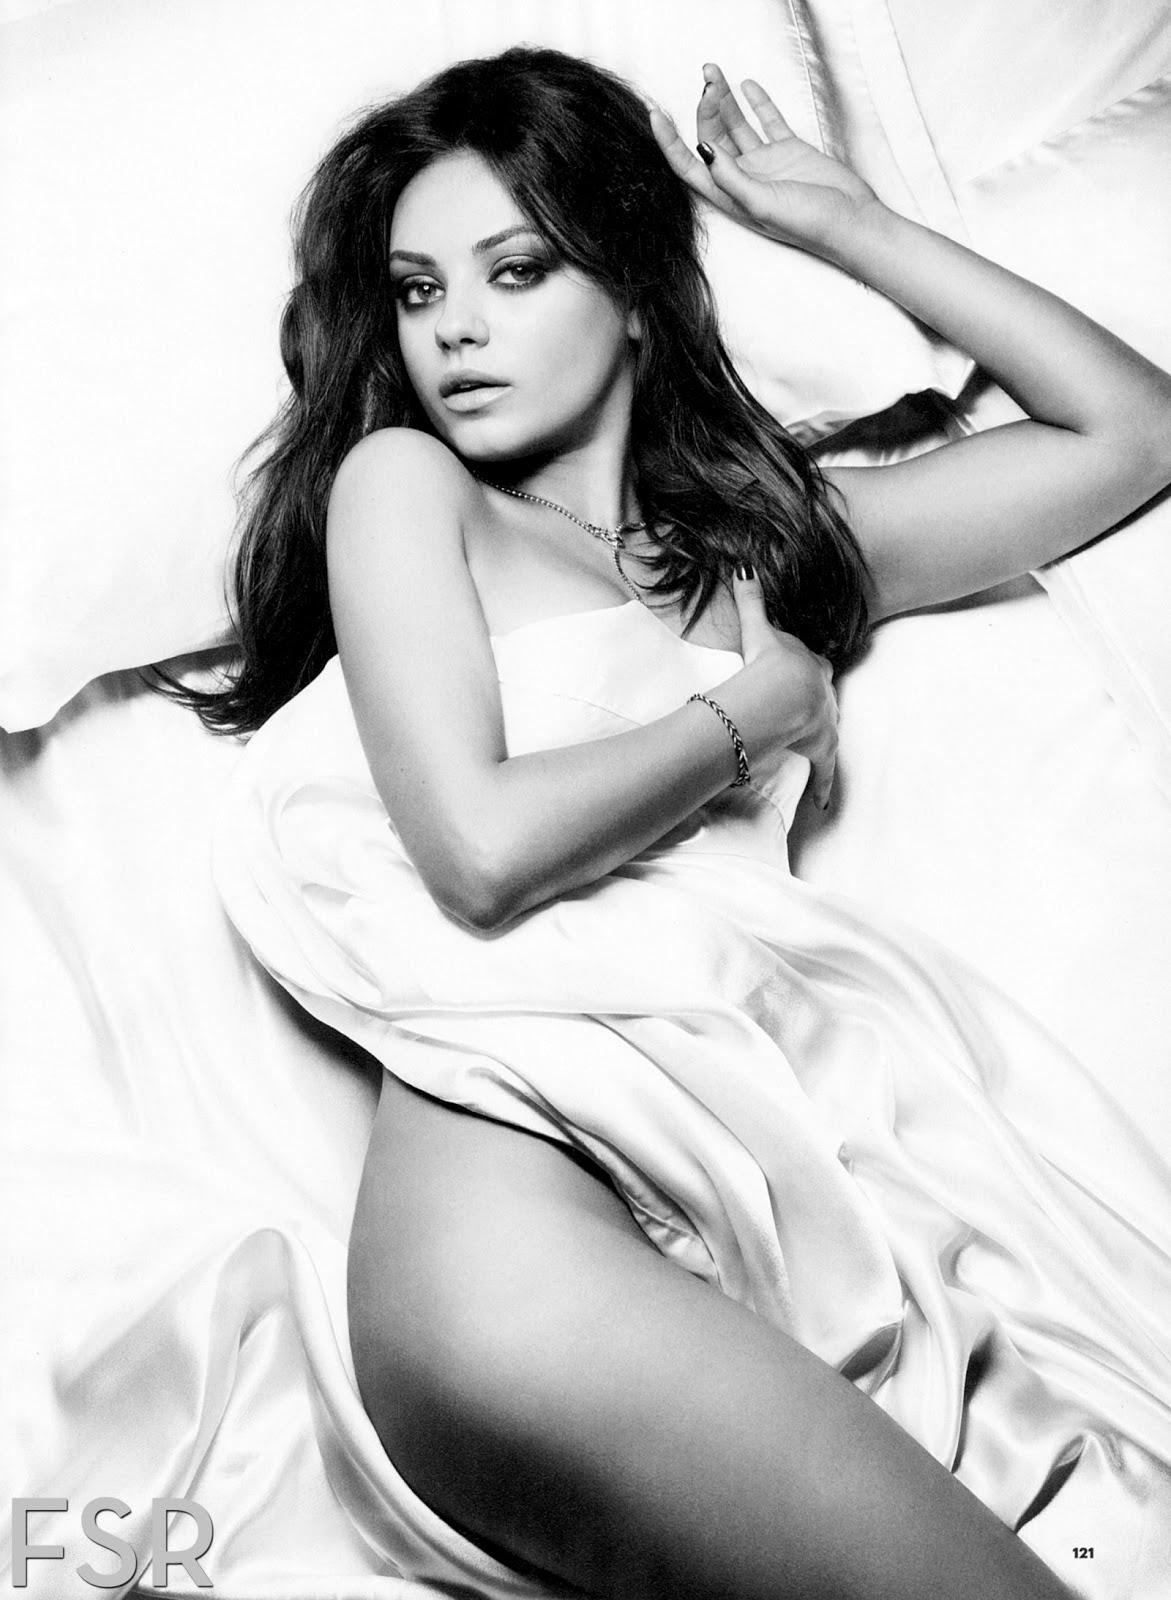 http://2.bp.blogspot.com/-NyBJCFJRwAM/UHSh_I-2ndI/AAAAAAAACjI/9Q092I-N3Tk/s1600/Mila-Kunis-esquire-novembro-2012-mulher-mais-sexy-do-mundo-3.jpg